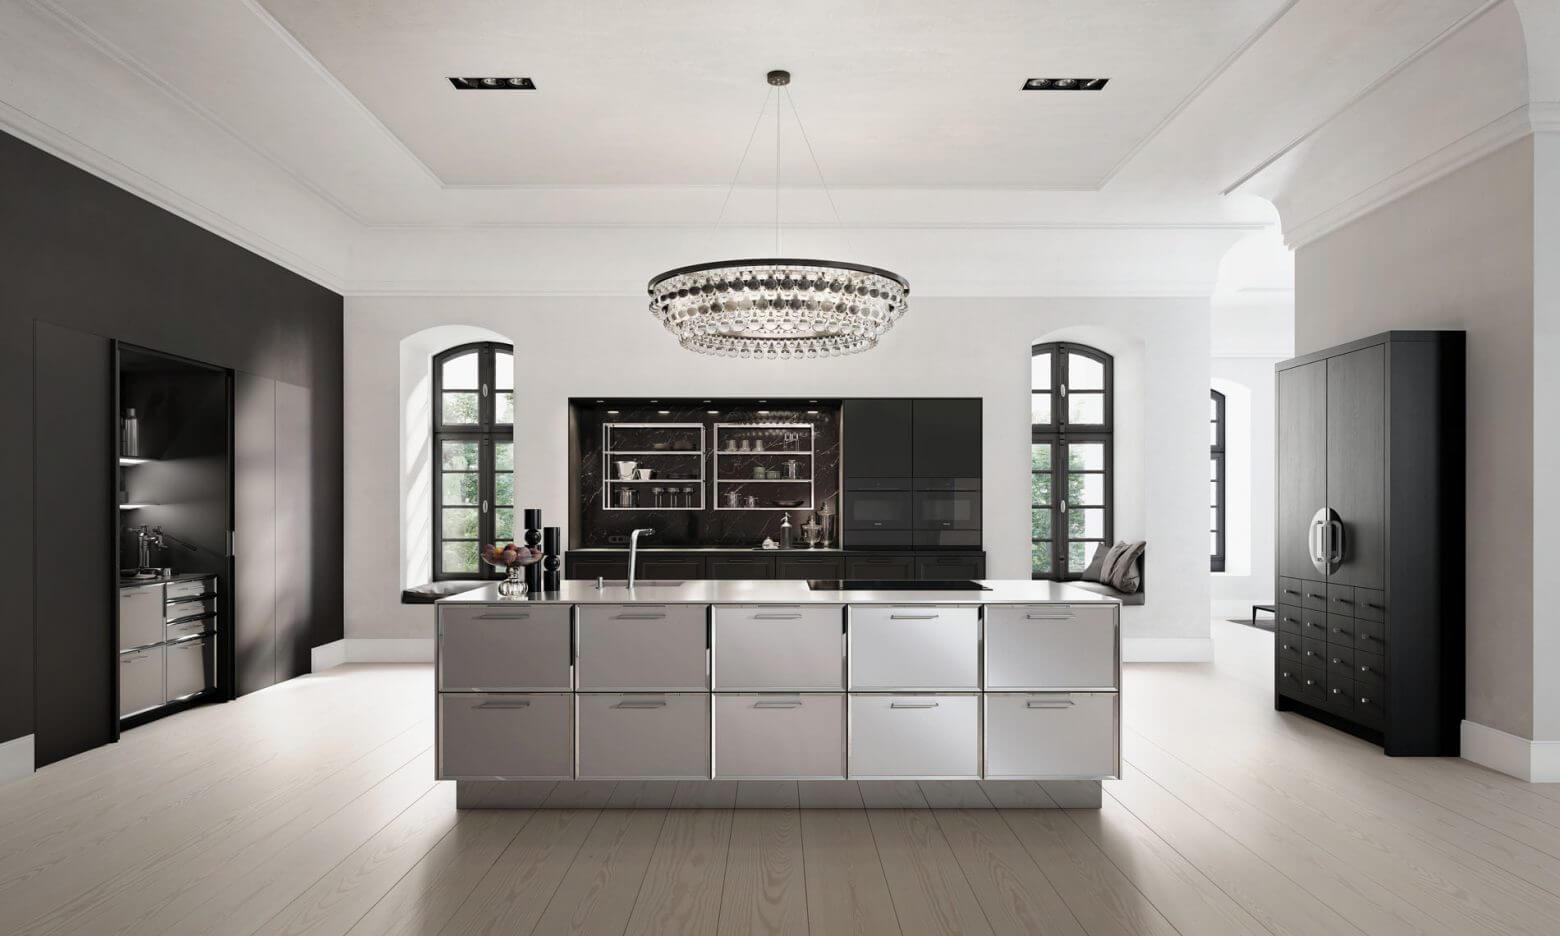 Ultra Moderne Keukens : Vlak fineer met kleine knopen dsm keukens